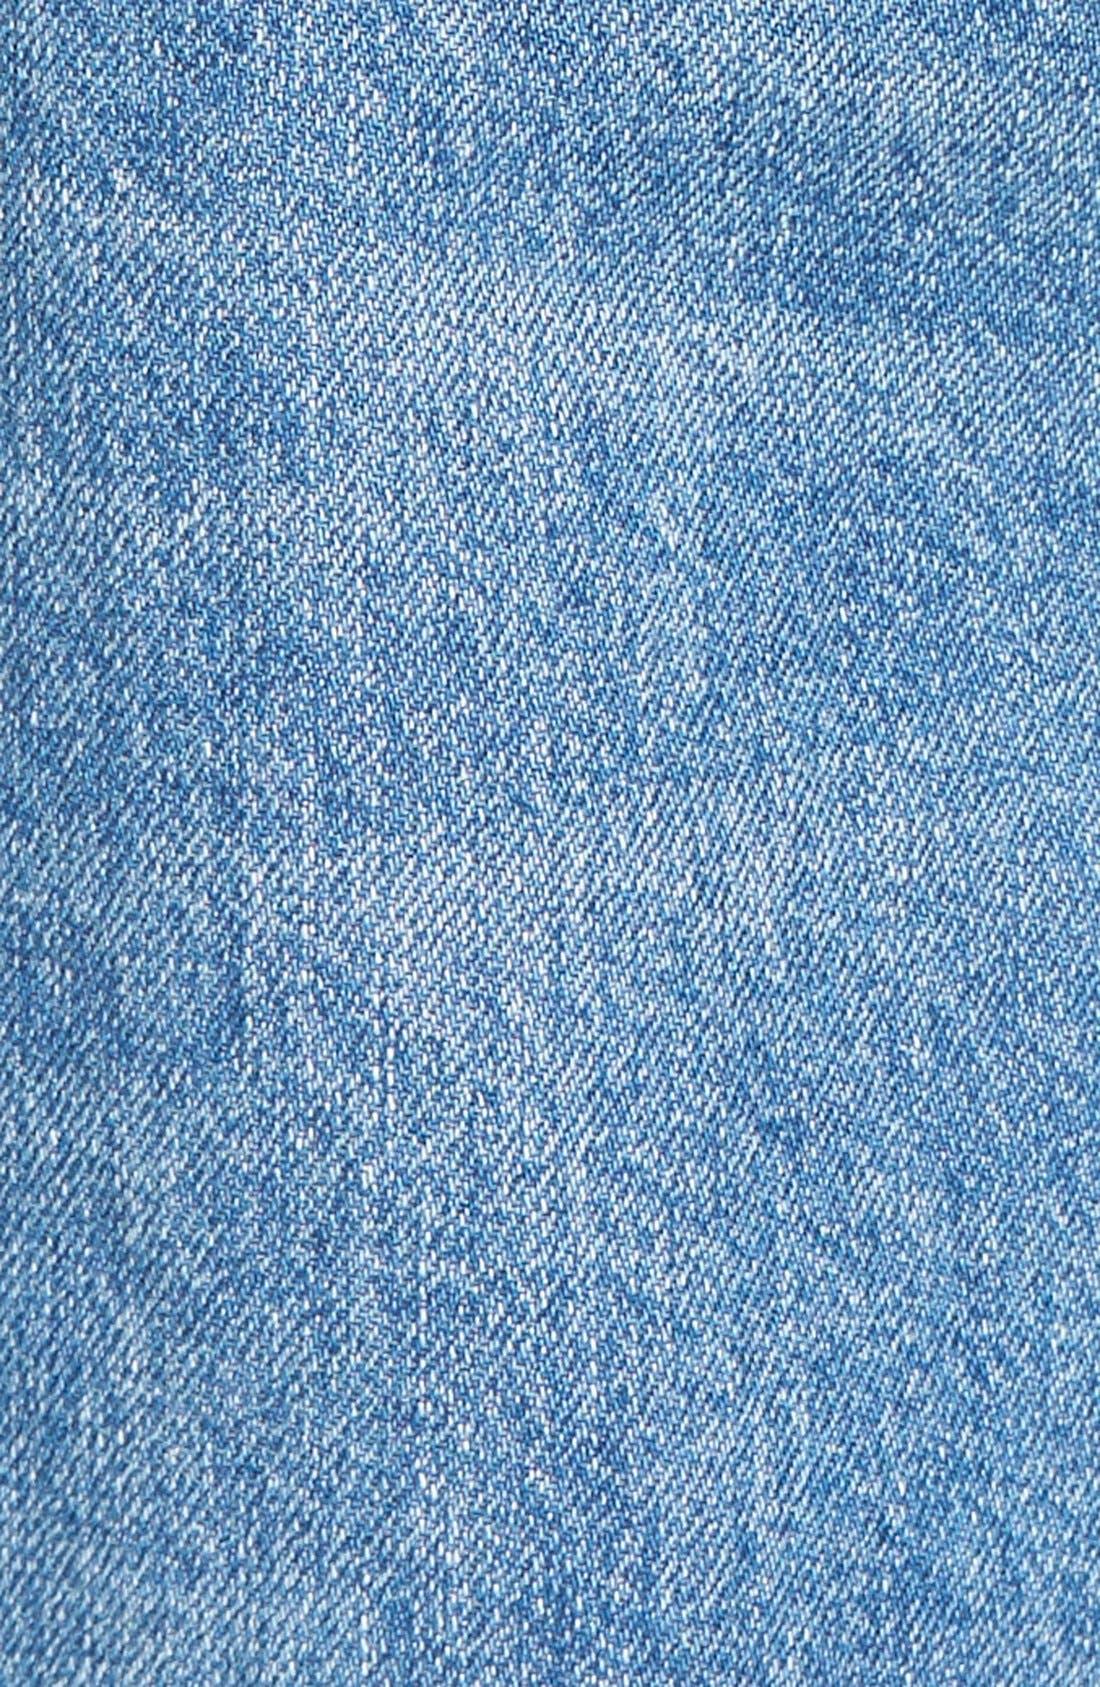 Hepburn High Rise Wide Leg Jeans,                             Alternate thumbnail 5, color,                             Slate